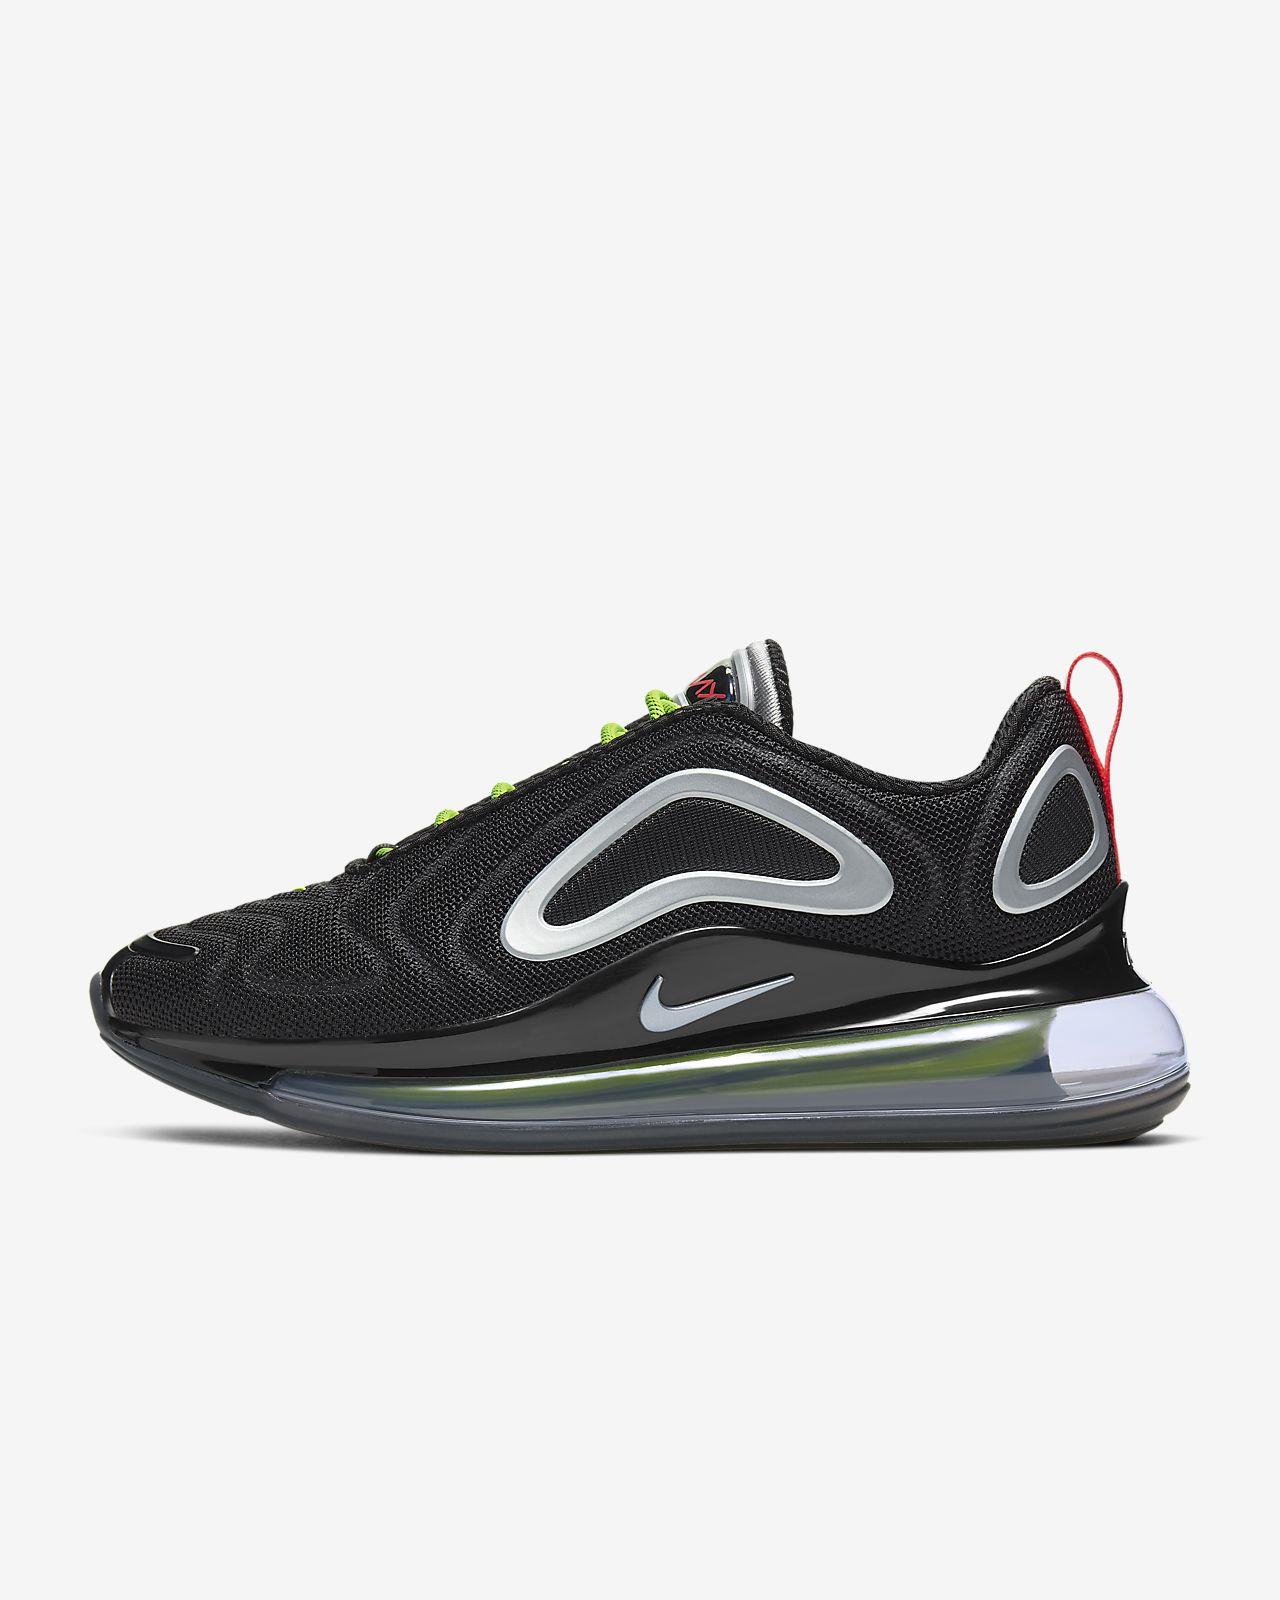 This Nike Air Max 720